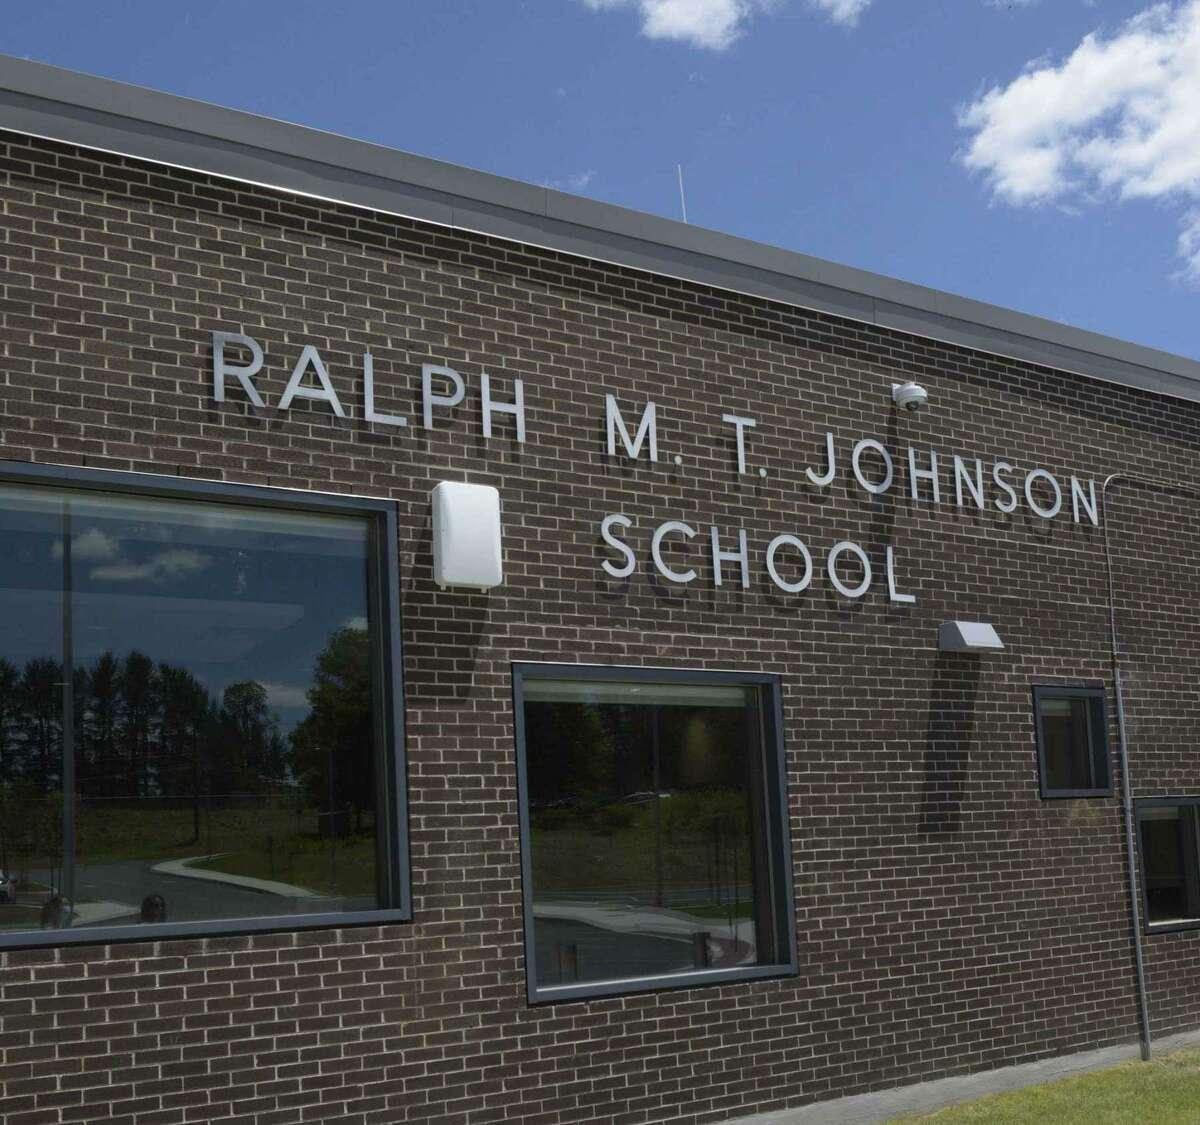 Ralph M. T. Johnson School in Bethel, Conn.